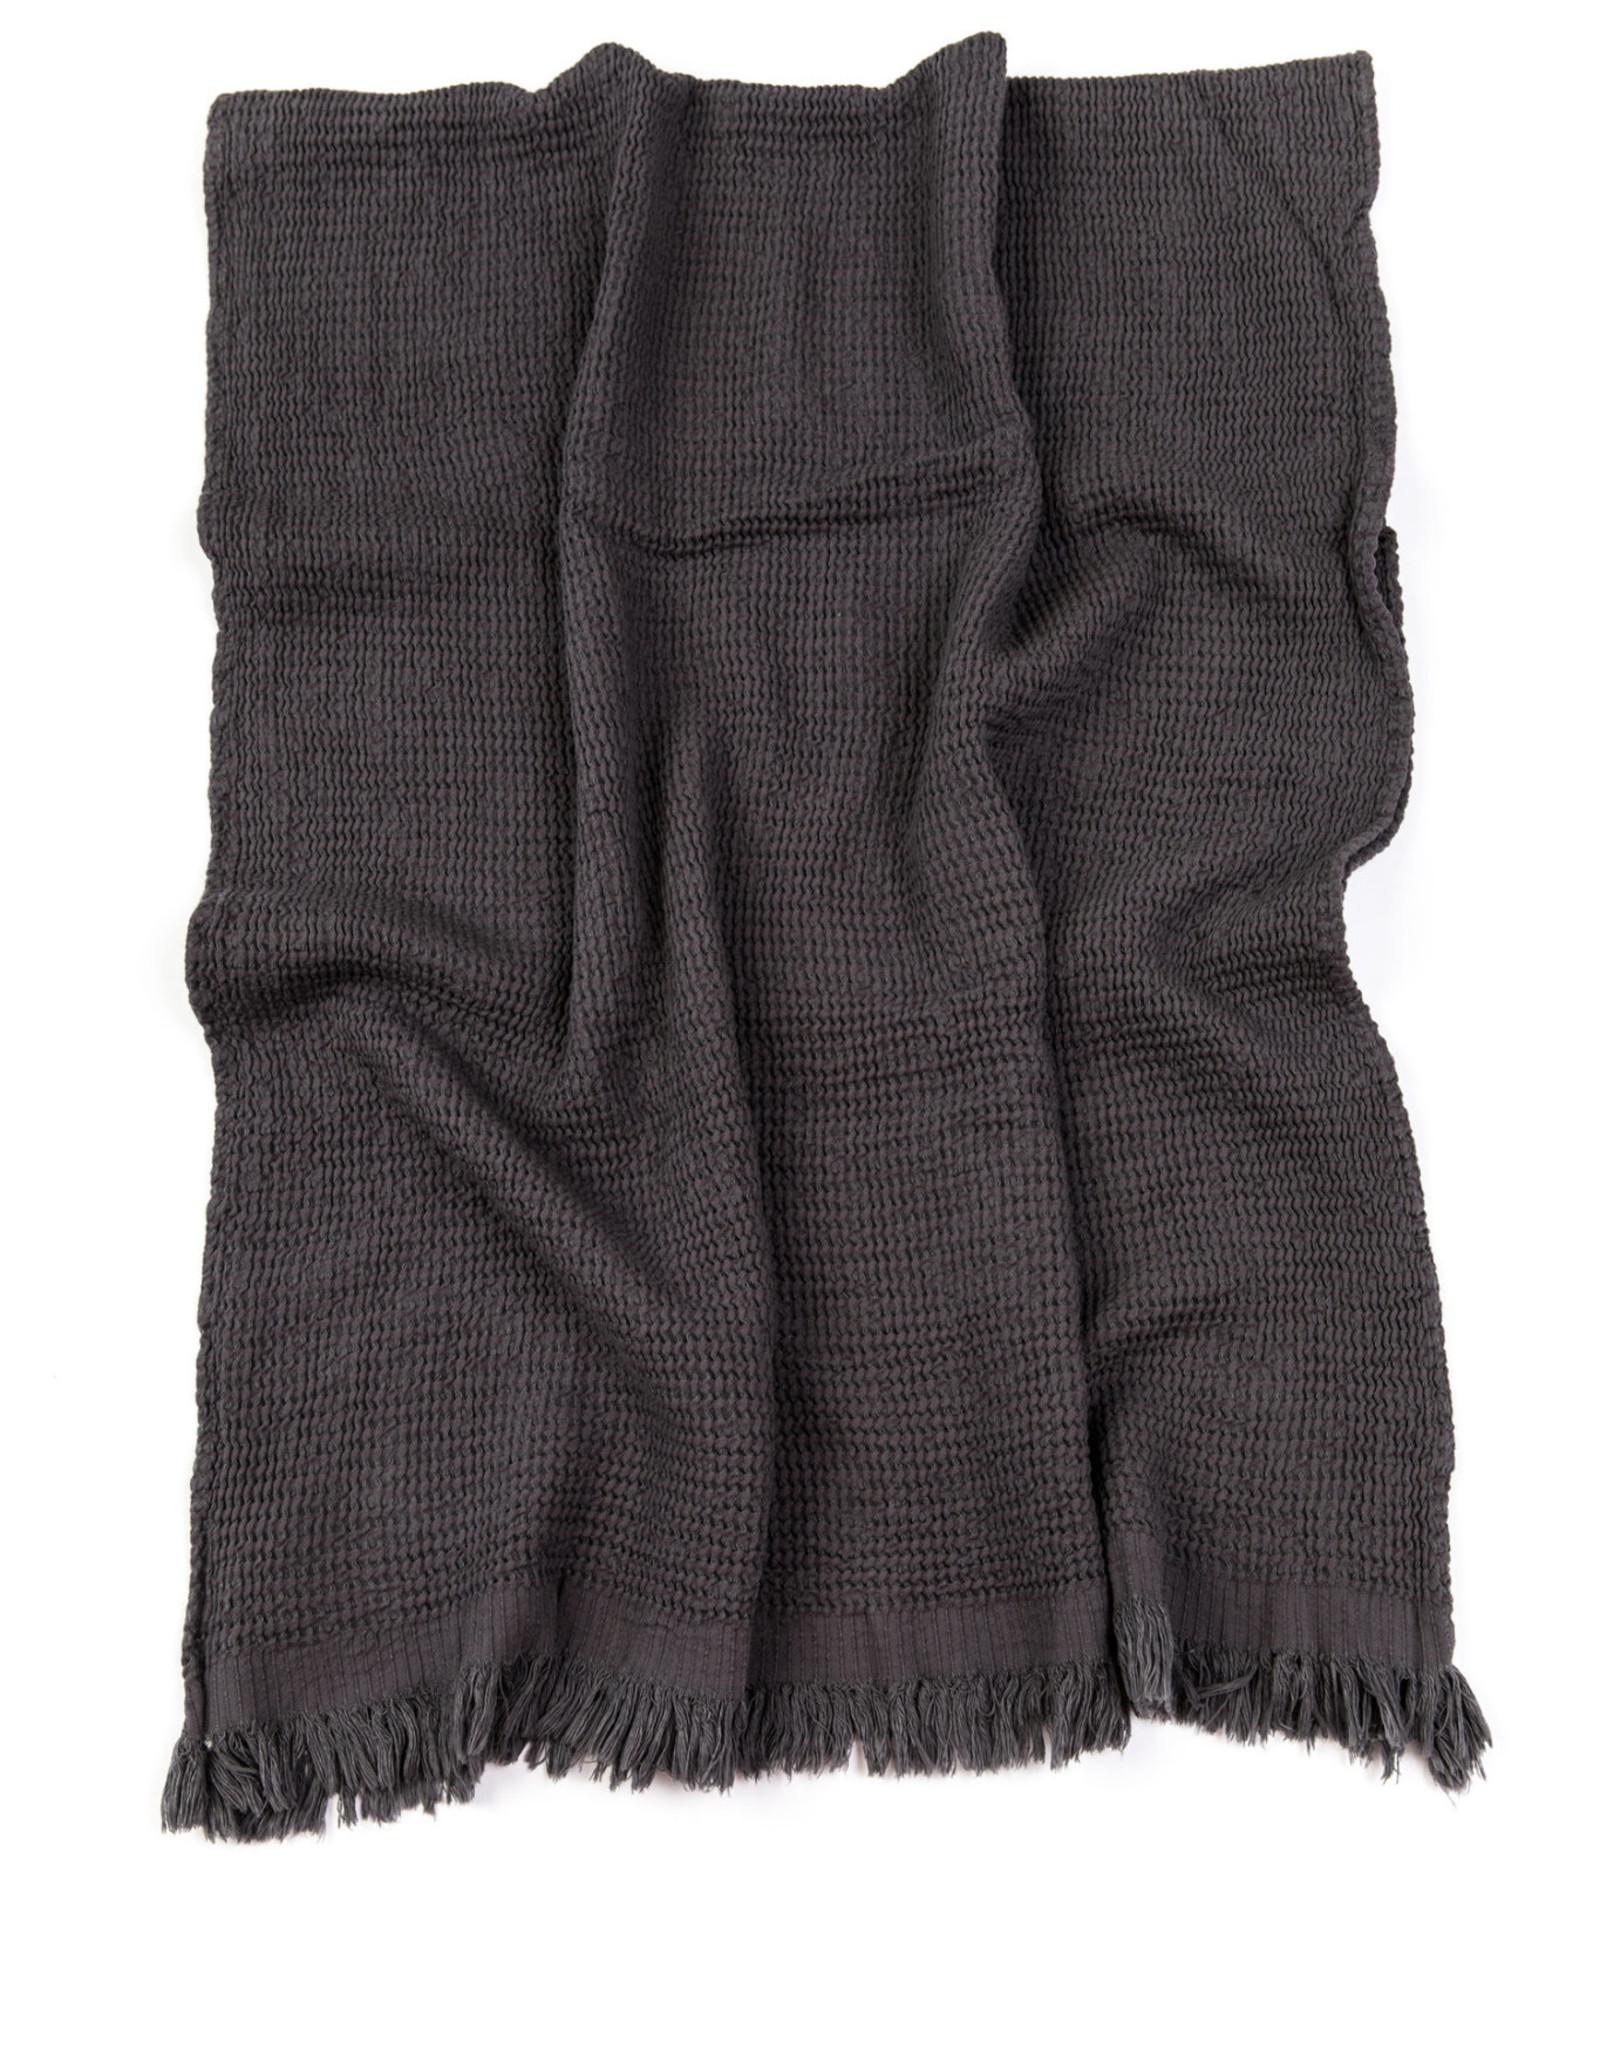 Ella Waffle Weave Turkish Towel